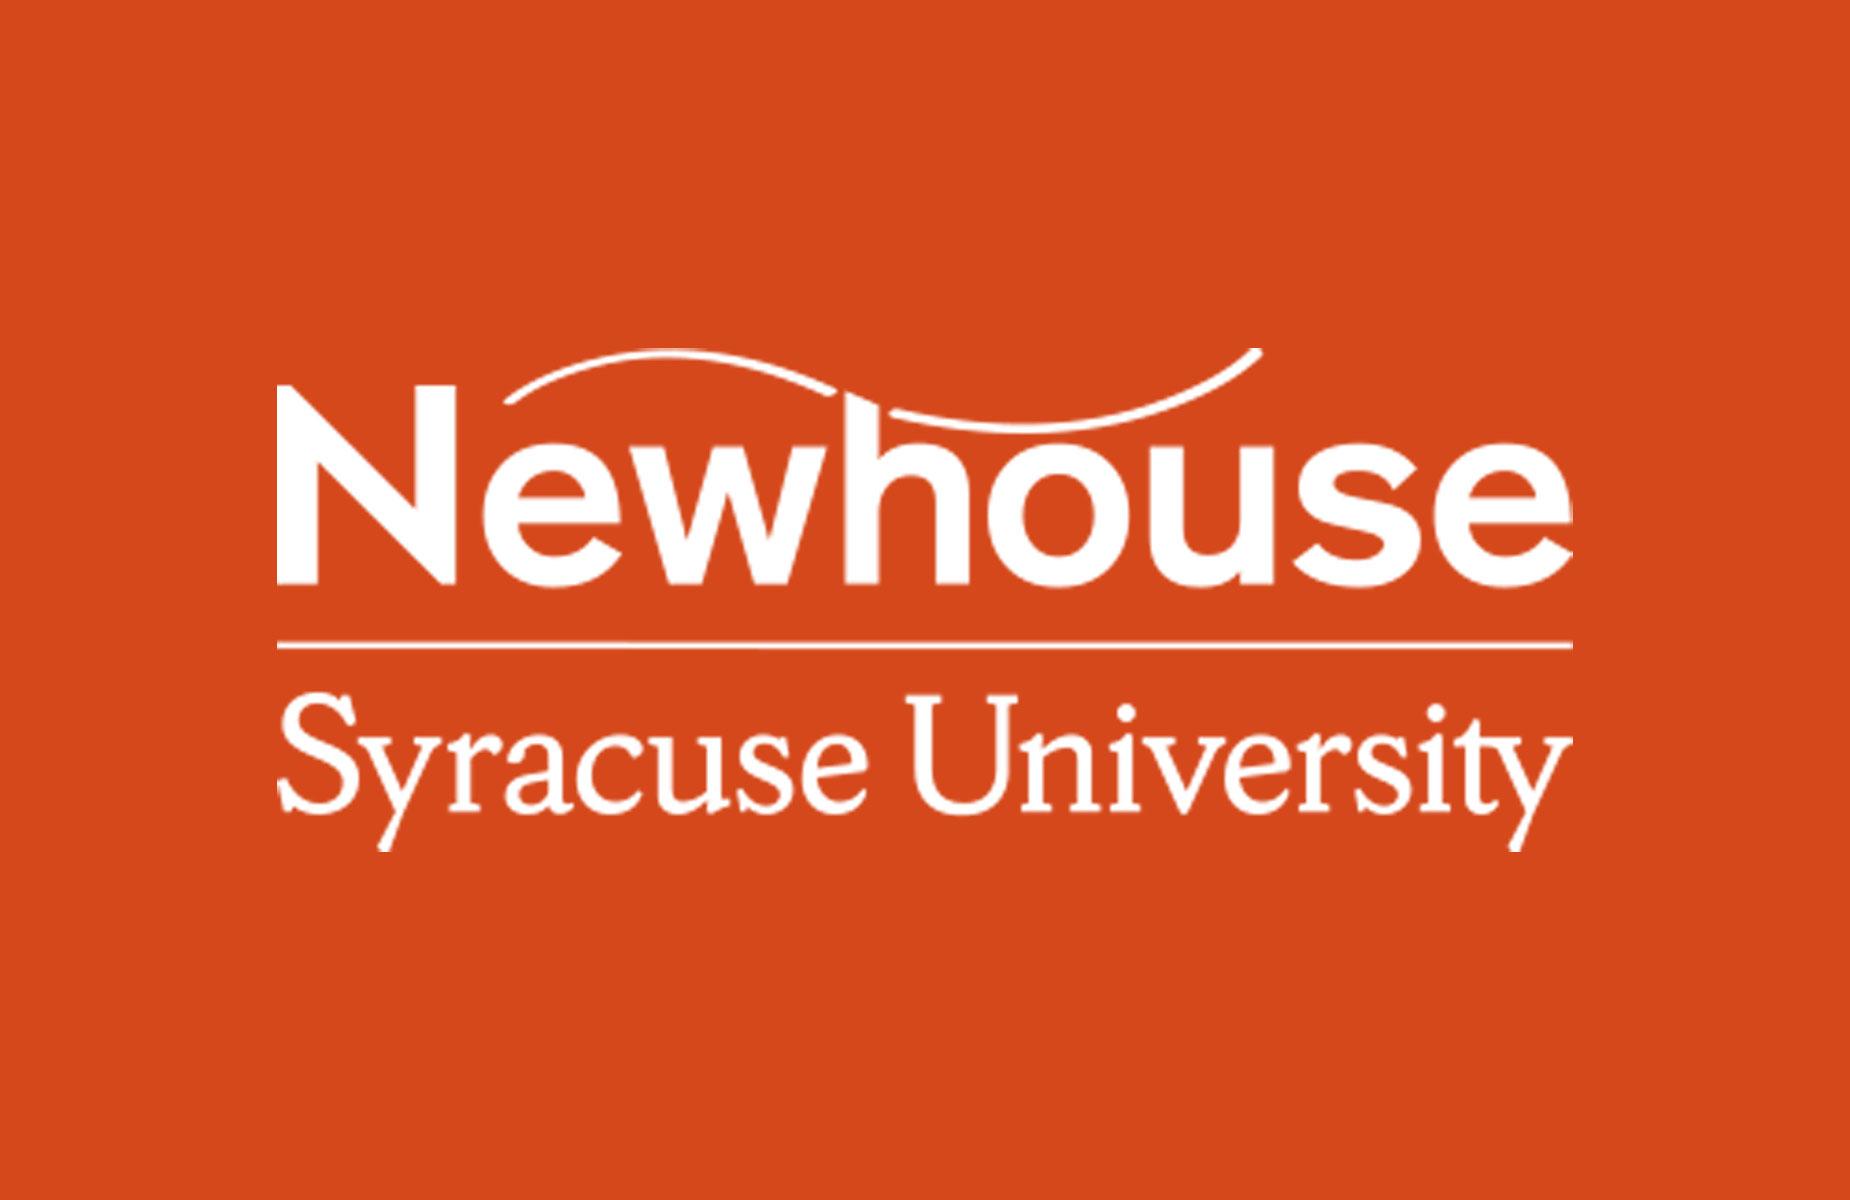 Syracuse University - View case study